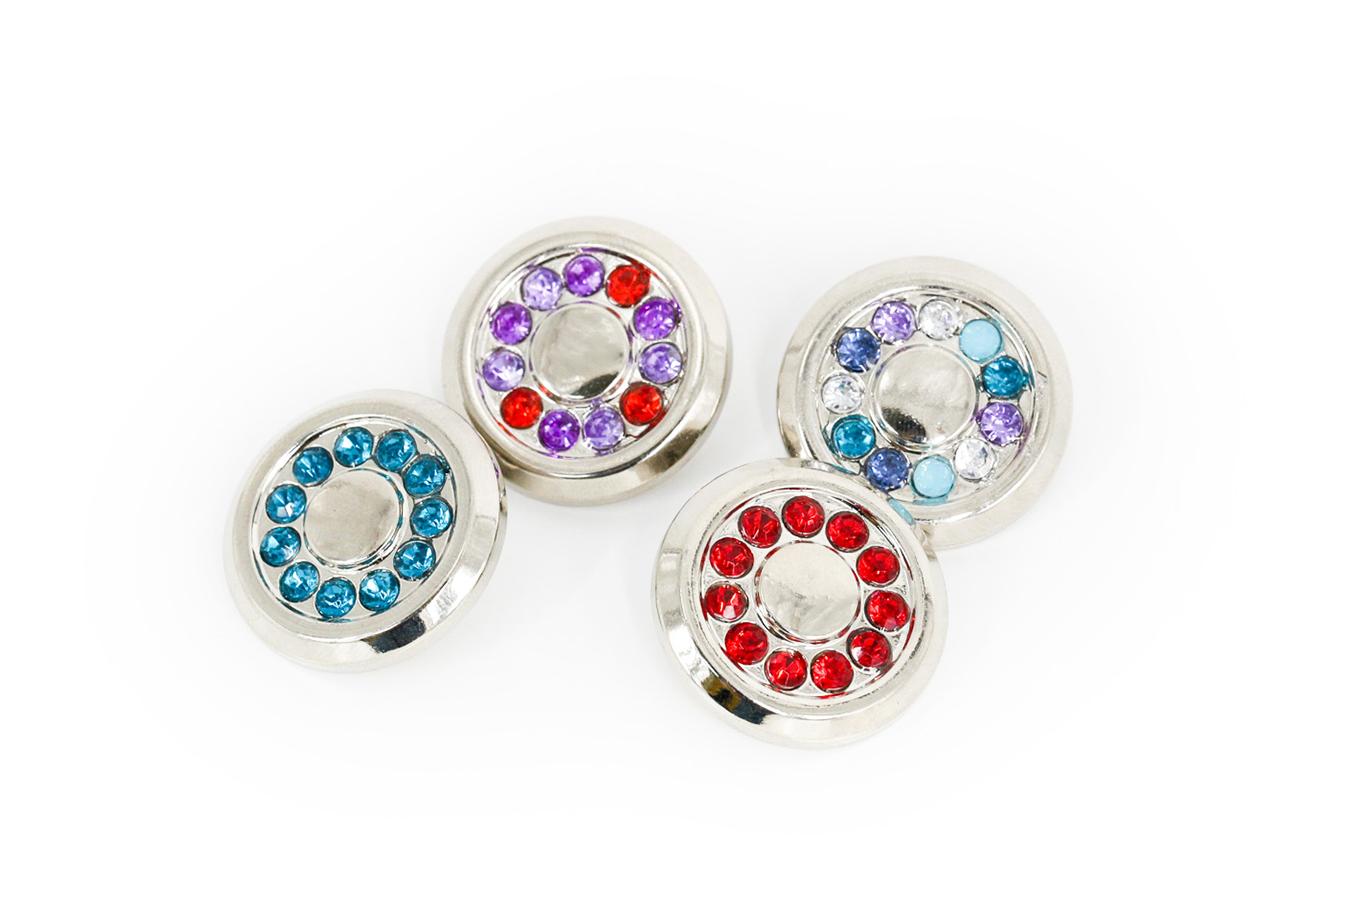 Fashion Round Berbentuk 1 Inch Diamond Berlian Imitasi Tombol untuk Menjahit